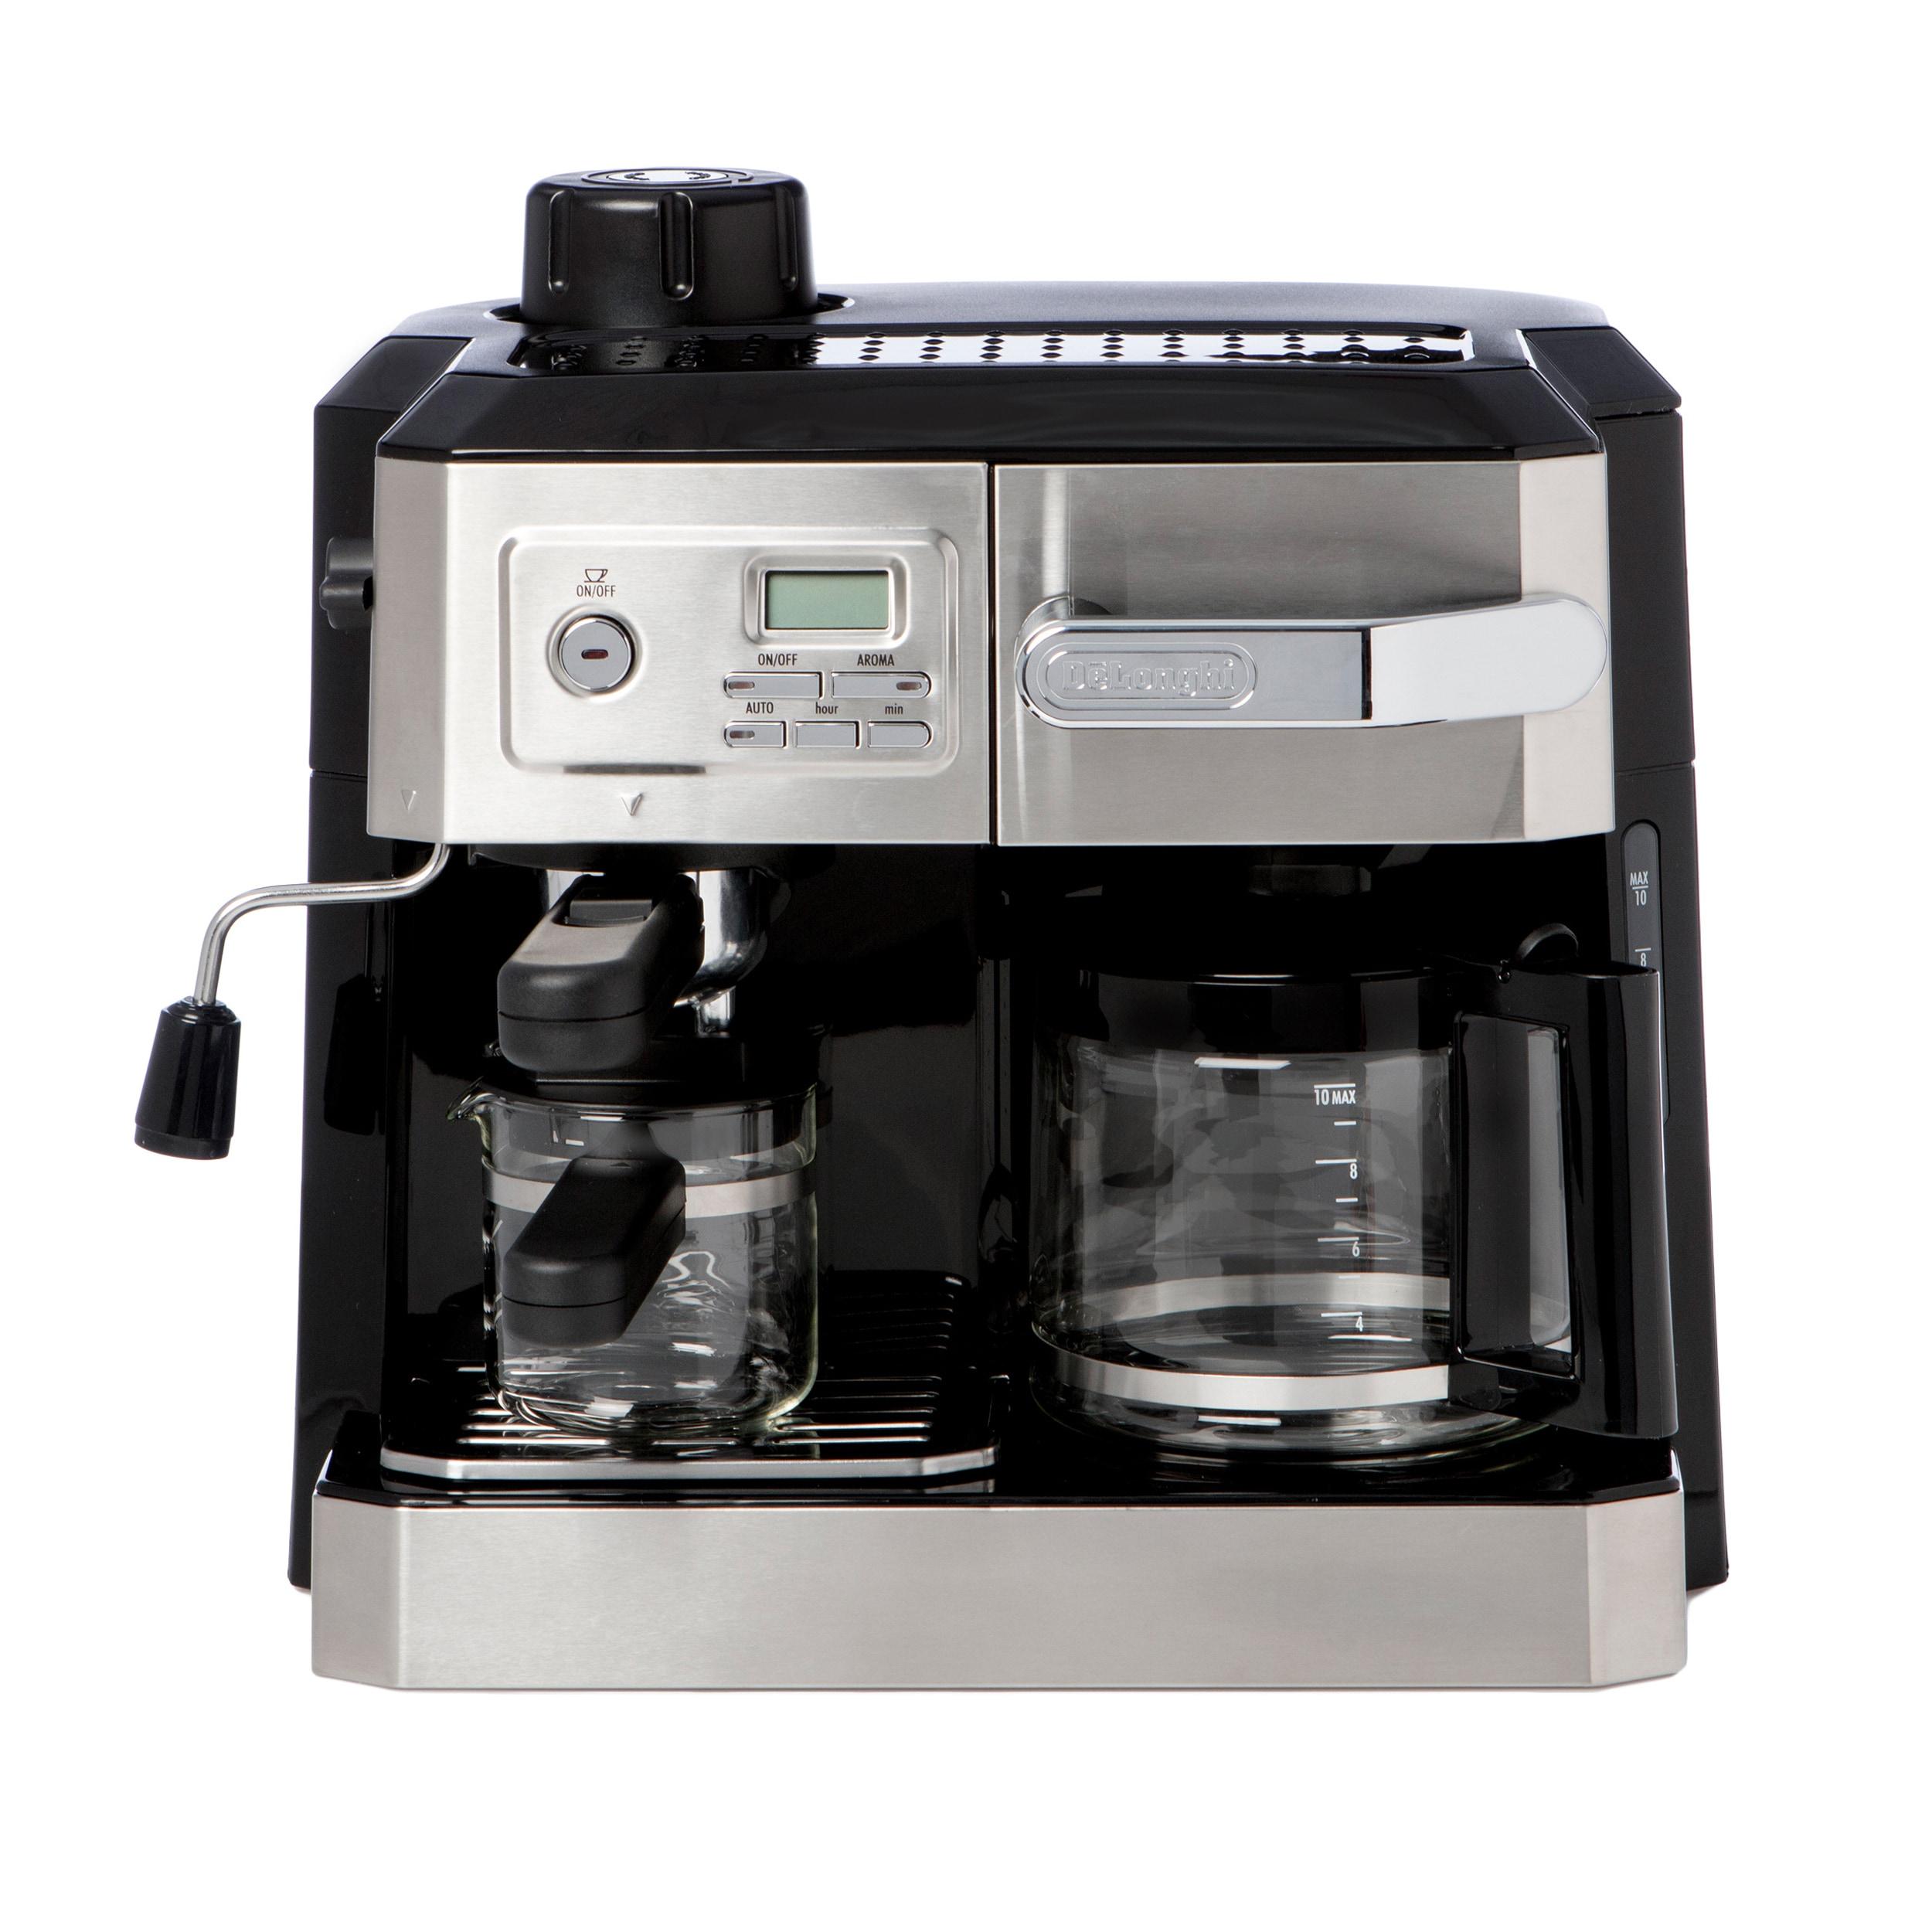 cappucino espresso machine maker coffee delonghi bar latte. Black Bedroom Furniture Sets. Home Design Ideas